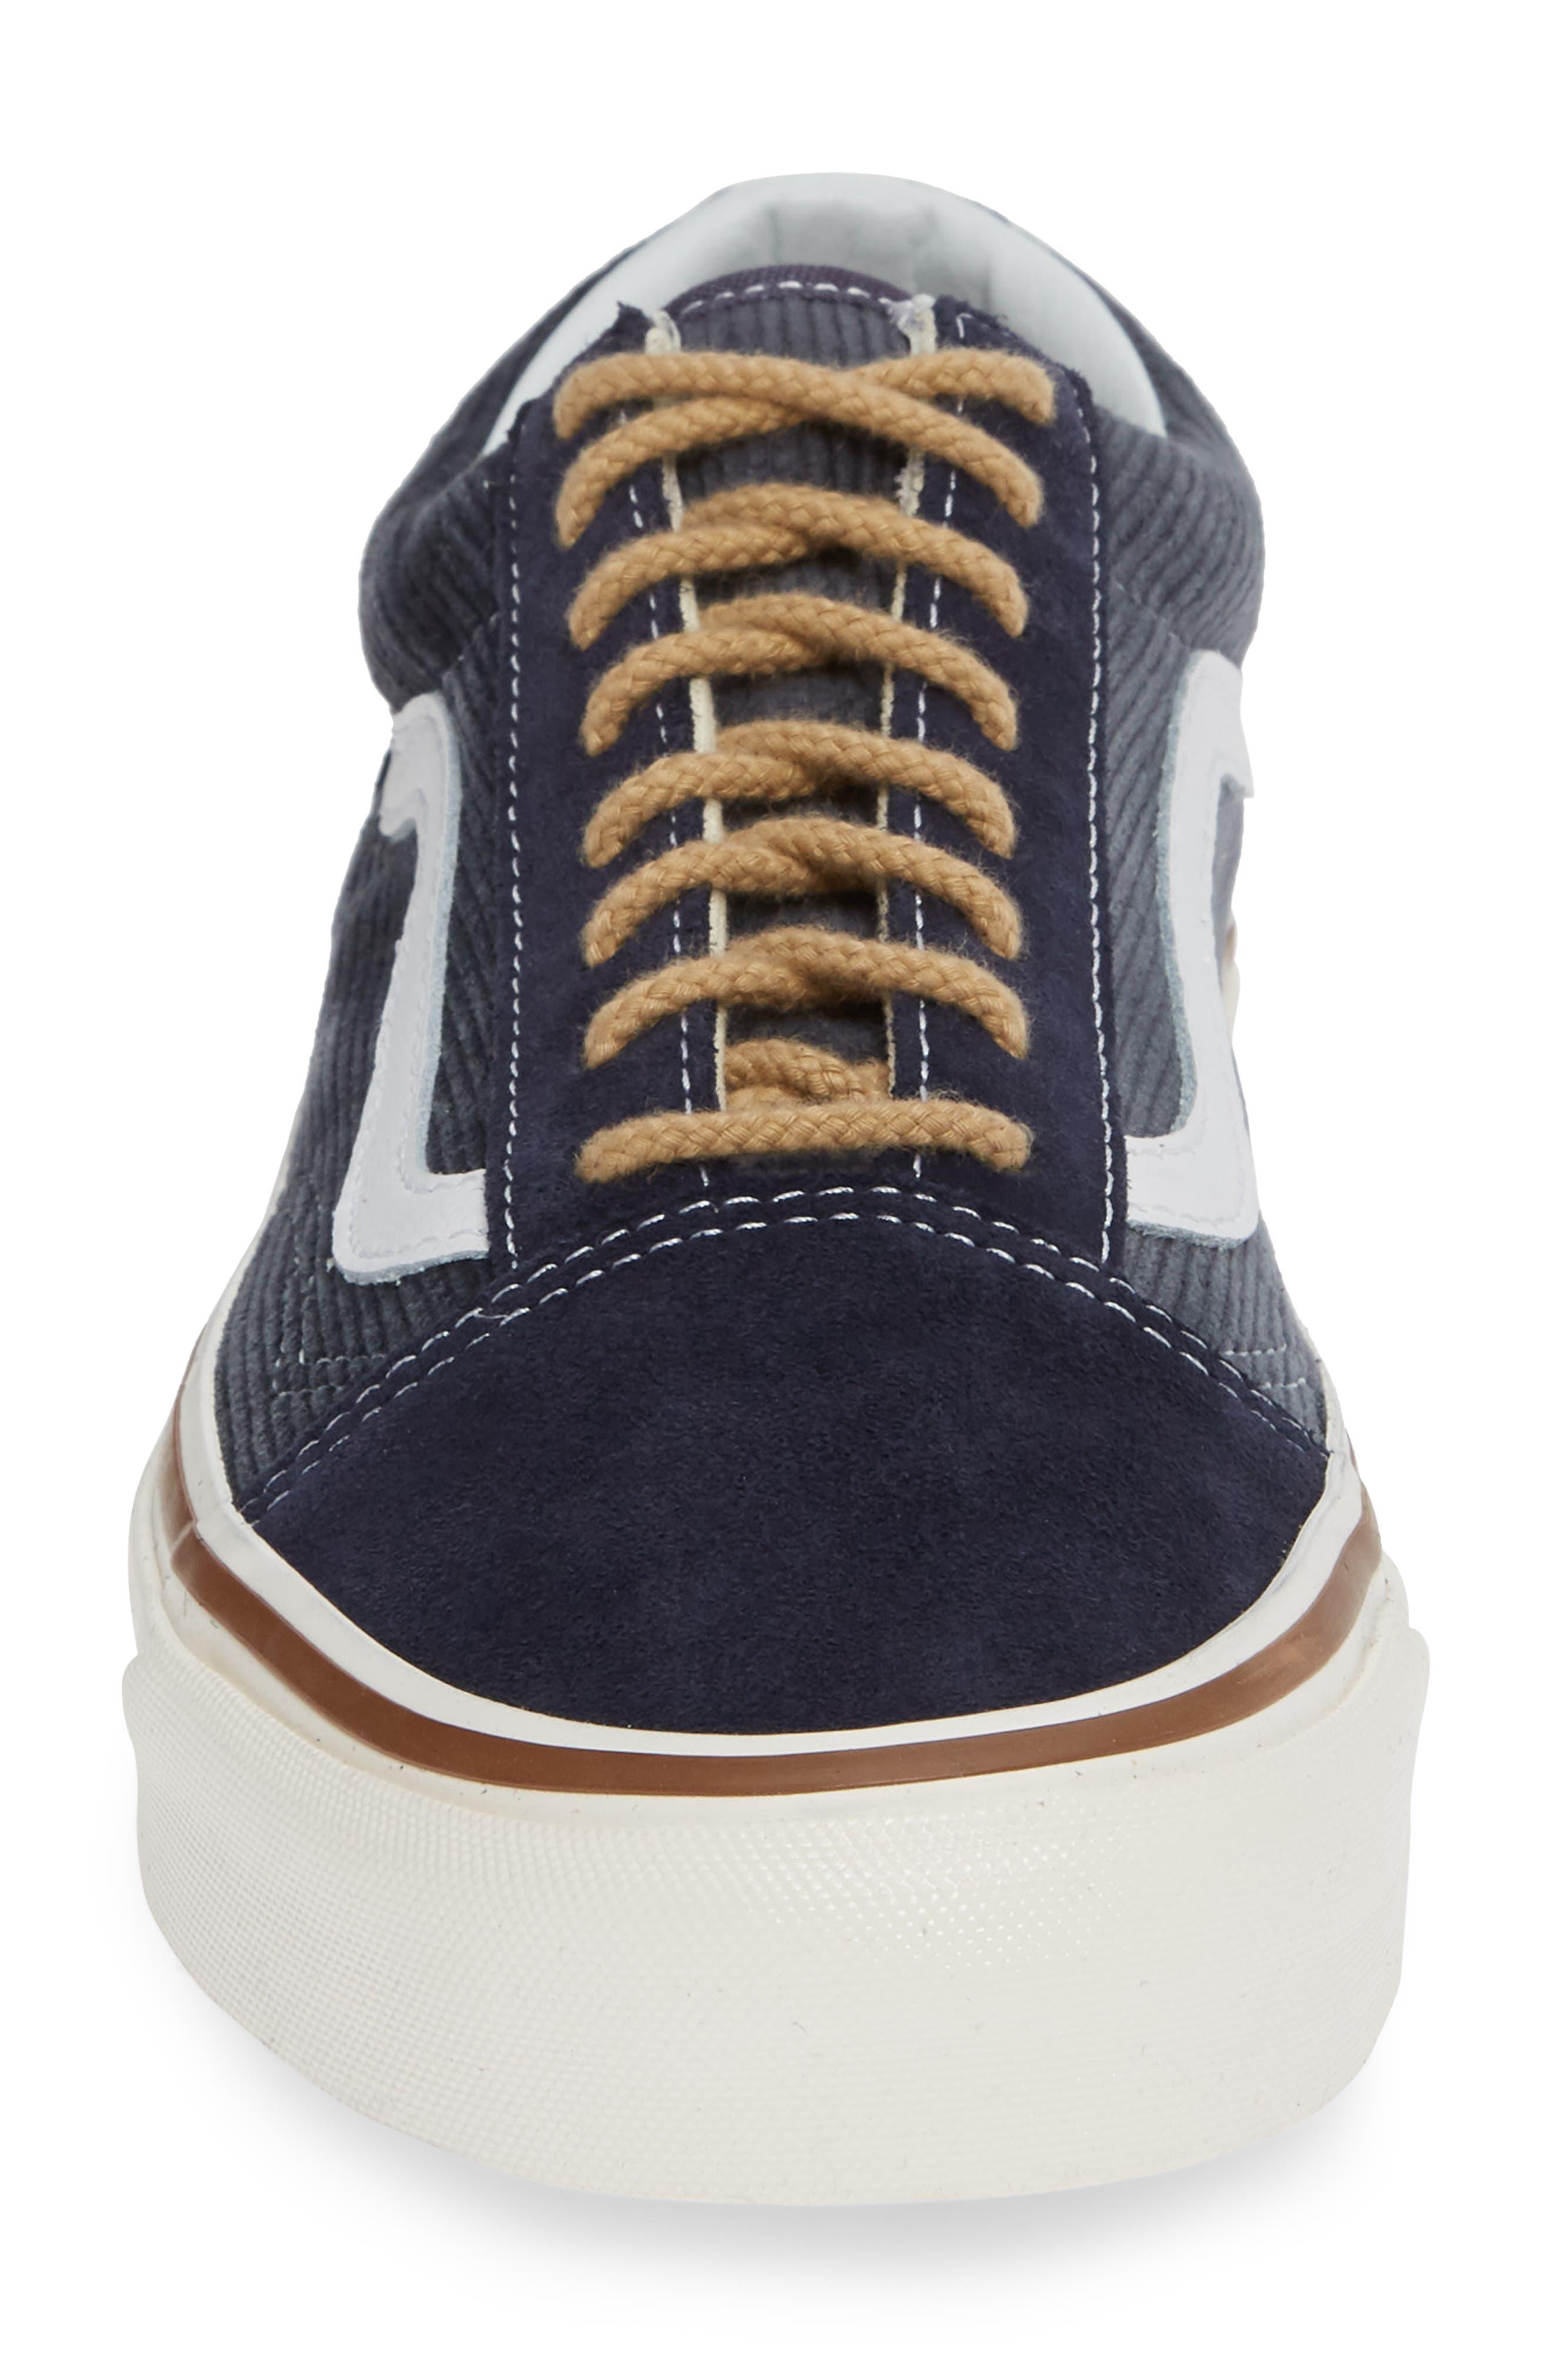 Anaheim Factory Old Skool 36 DX Sneaker,                             Alternate thumbnail 4, color,                             NAVY/ SUEDE/ CORDUROY